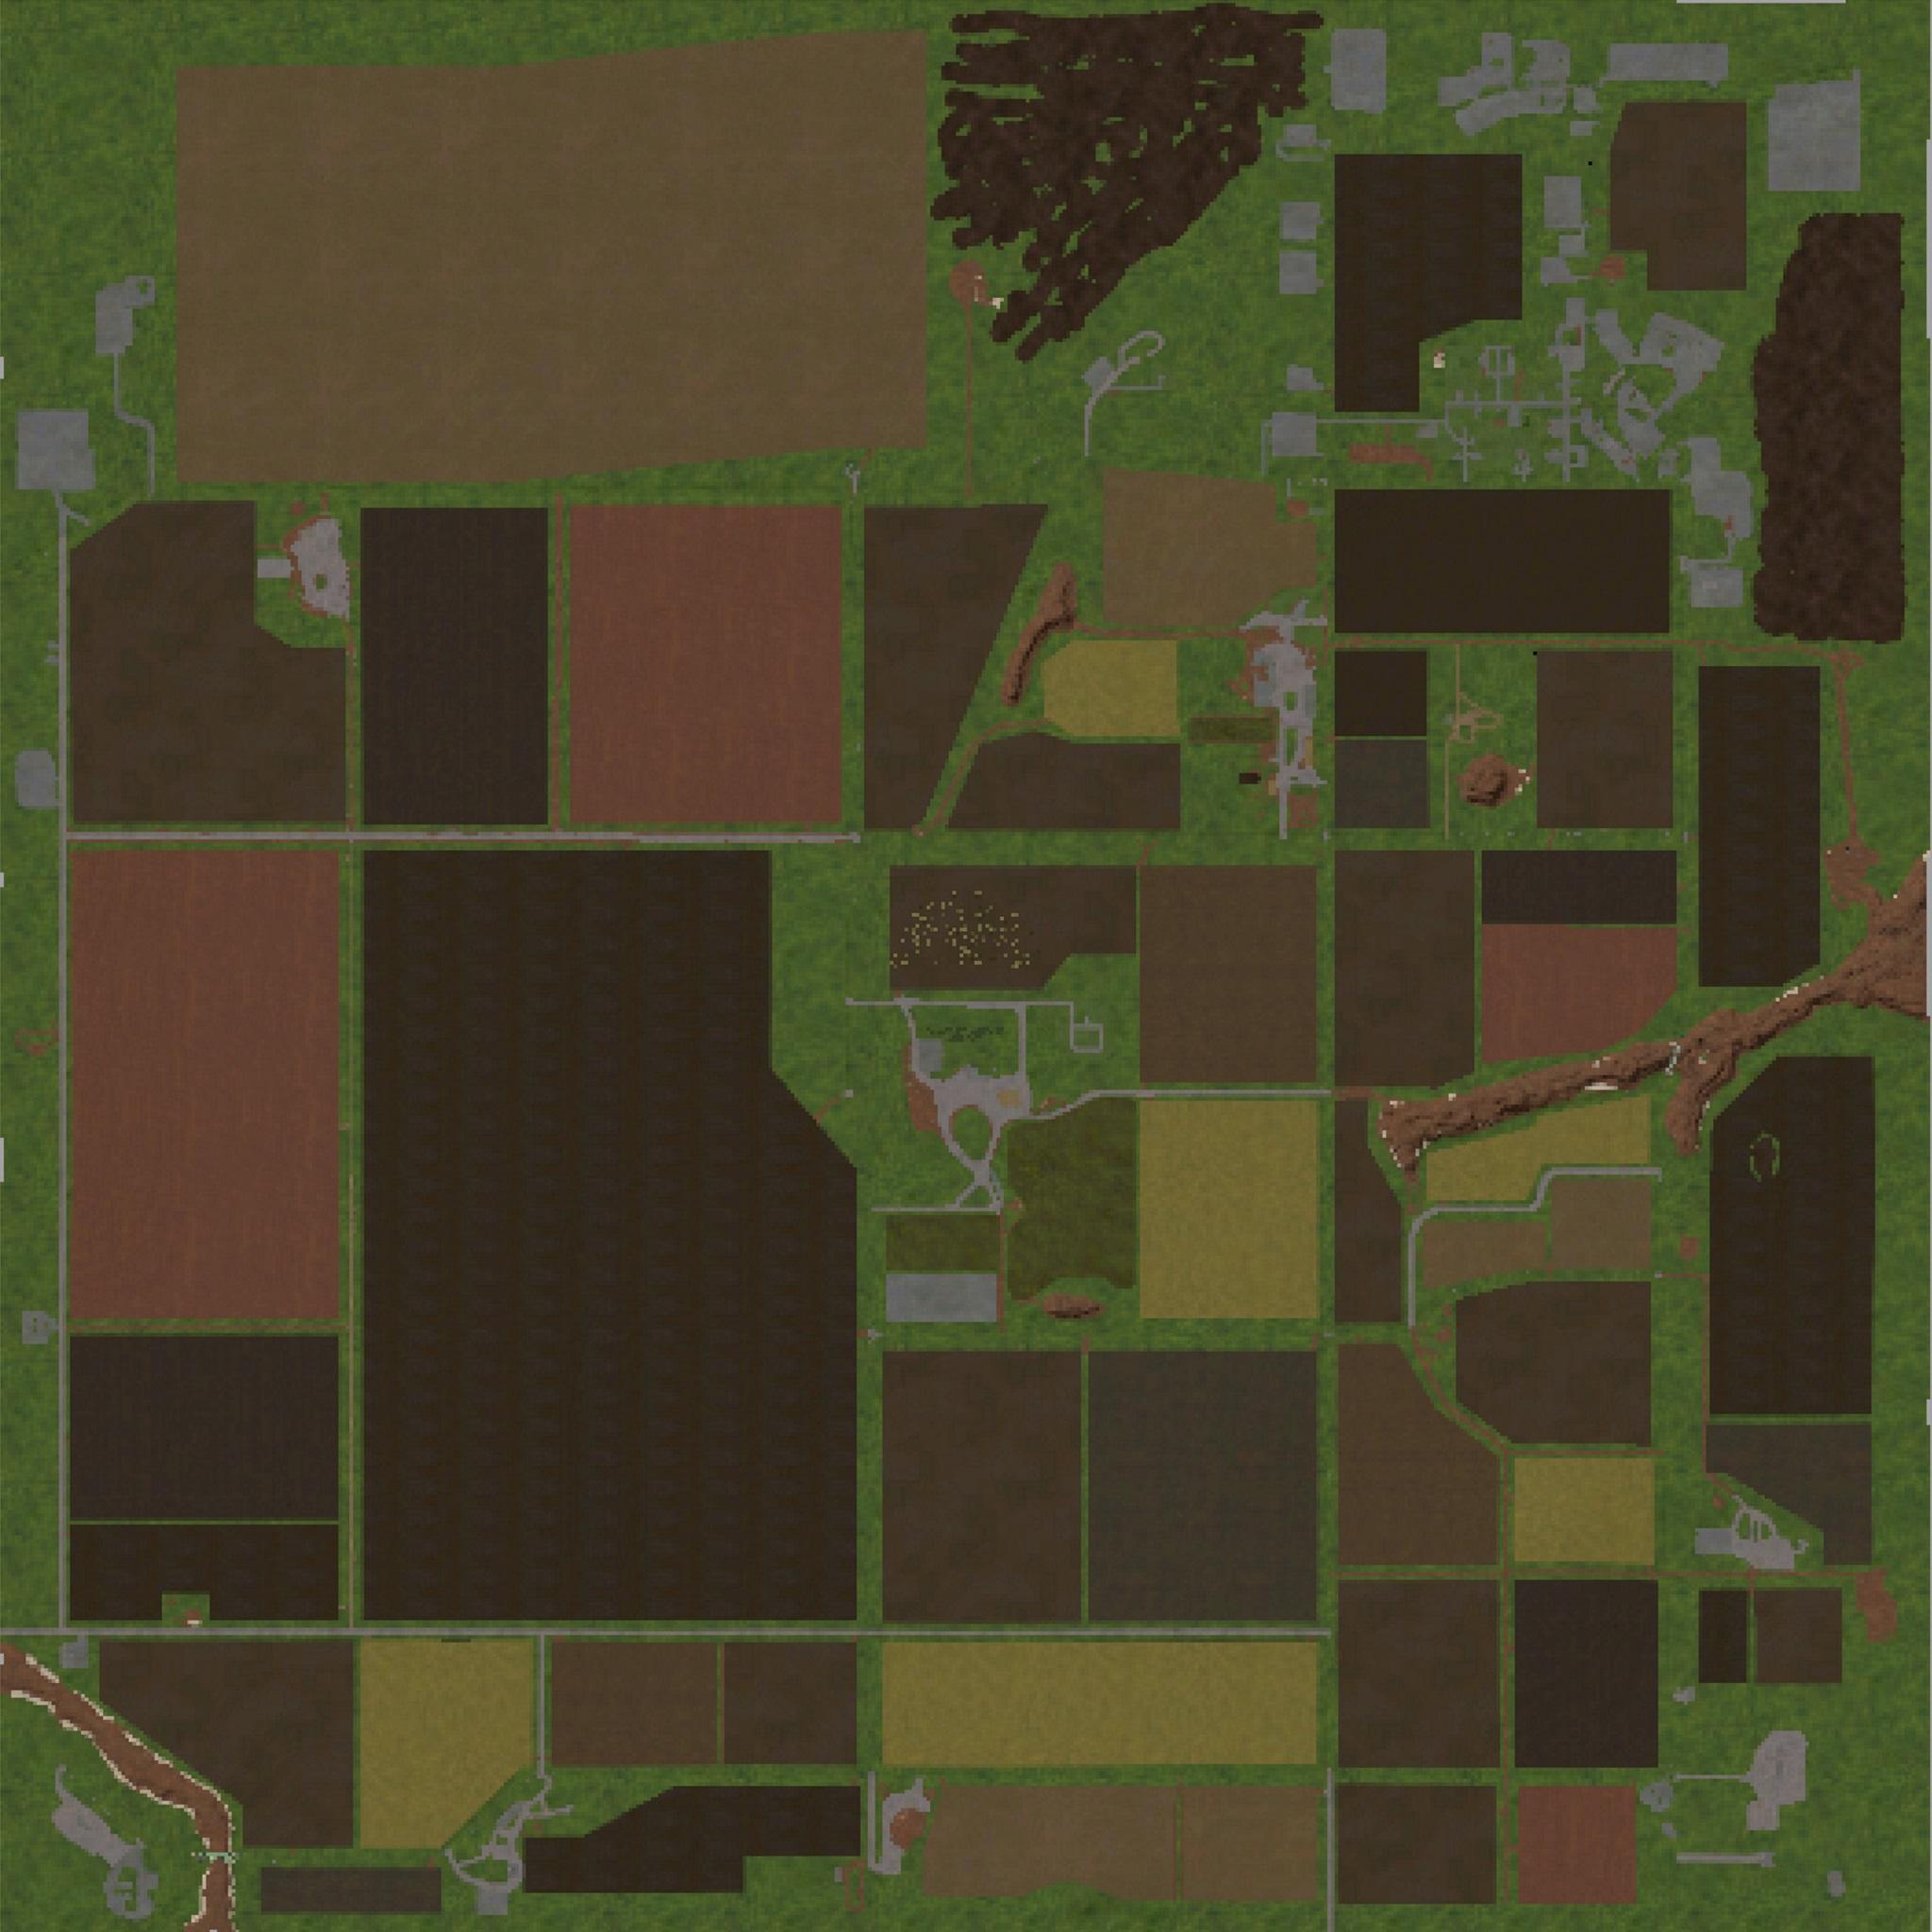 Fs17 Oklahoma Usa 2017 Map V1 0 Farming Simulator 2019 2017